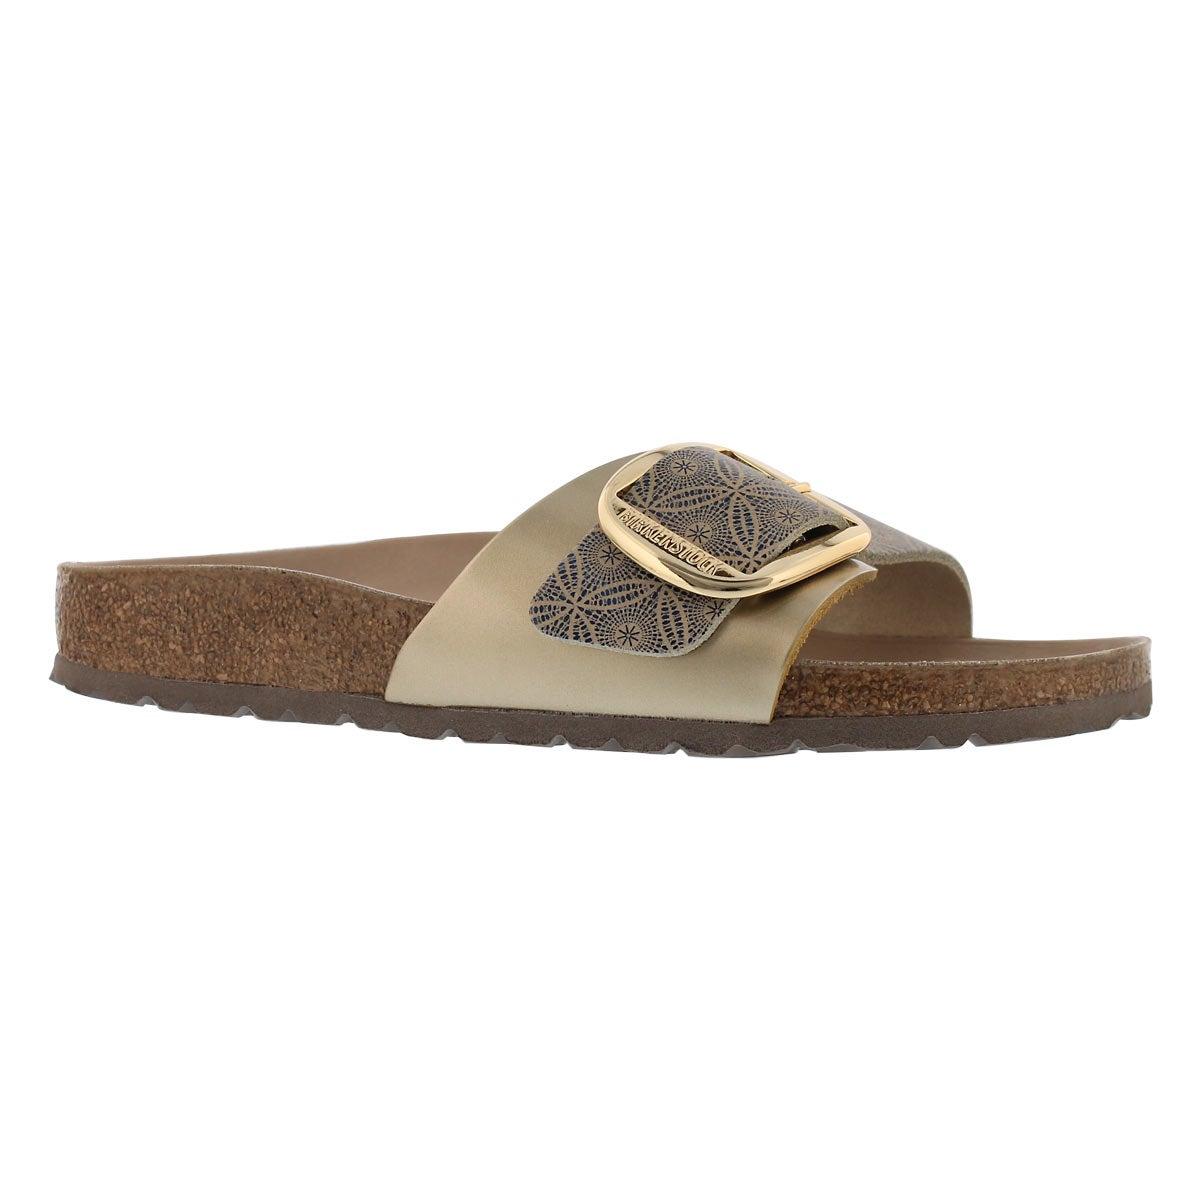 Women's MADRID BIG BUCKLE LTR sandals - Narrow